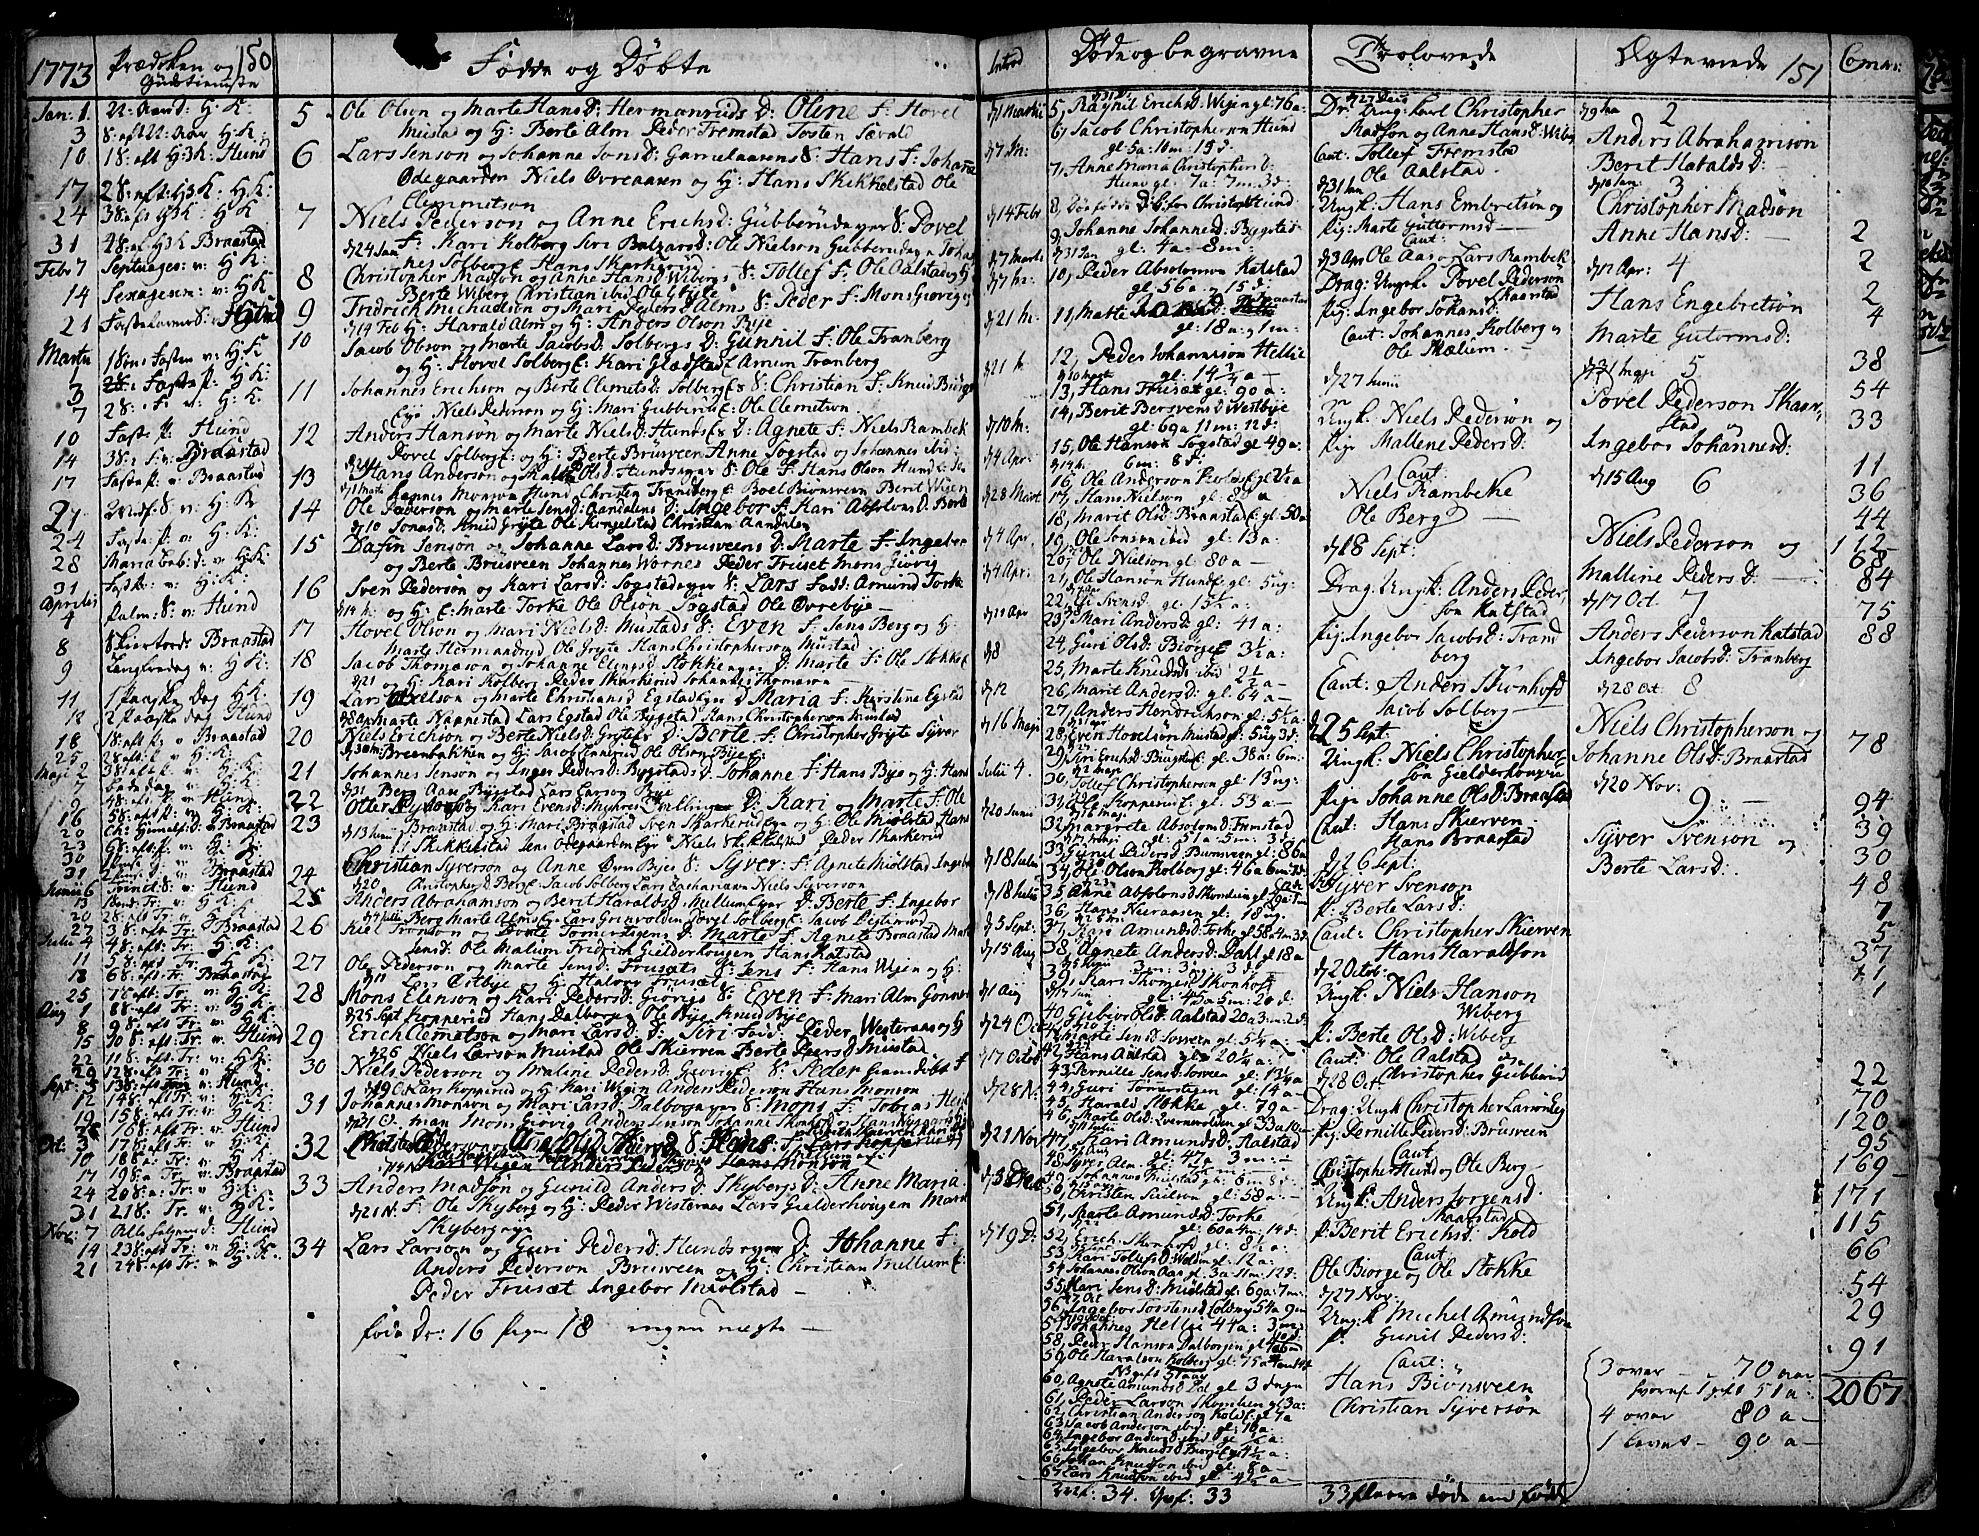 SAH, Vardal prestekontor, H/Ha/Haa/L0002: Ministerialbok nr. 2, 1748-1776, s. 150-151